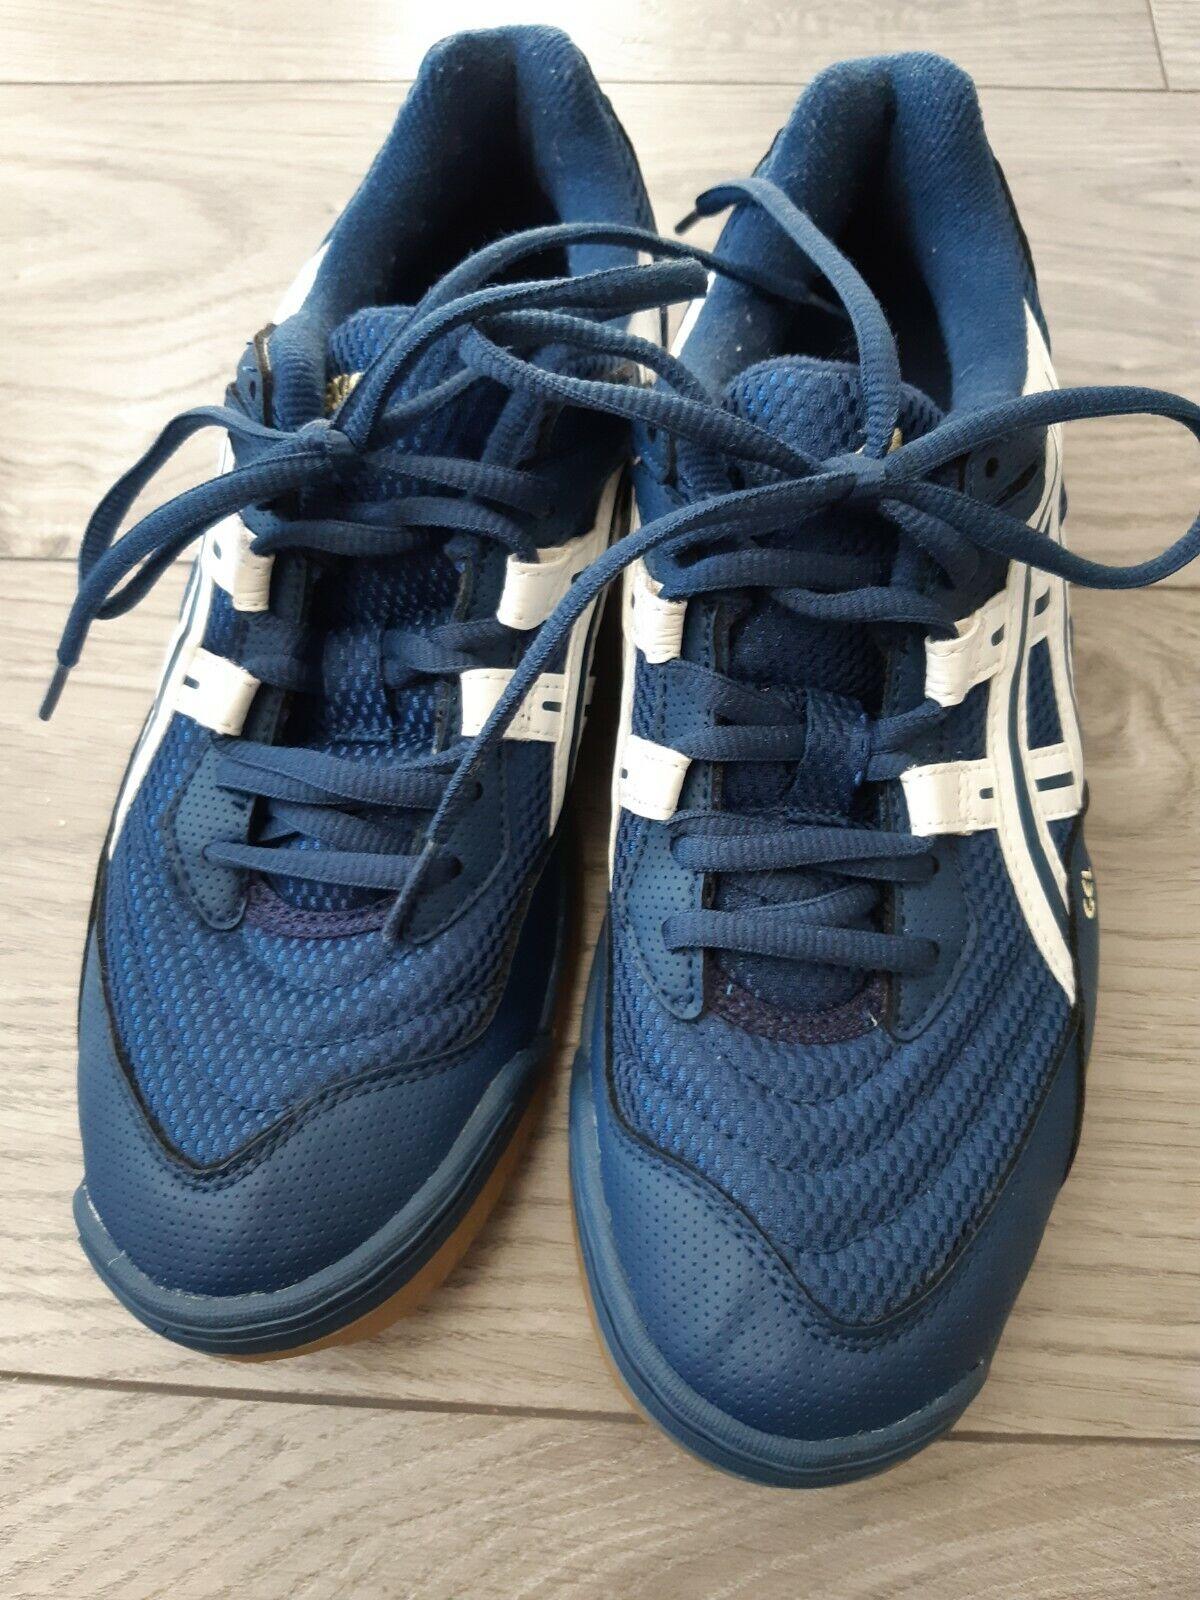 seta Reprimir asentamiento  ASICS GEL Hunter 2 Navy Blue White Lace up Trainers UK 5.5 EU 39 for sale |  eBay